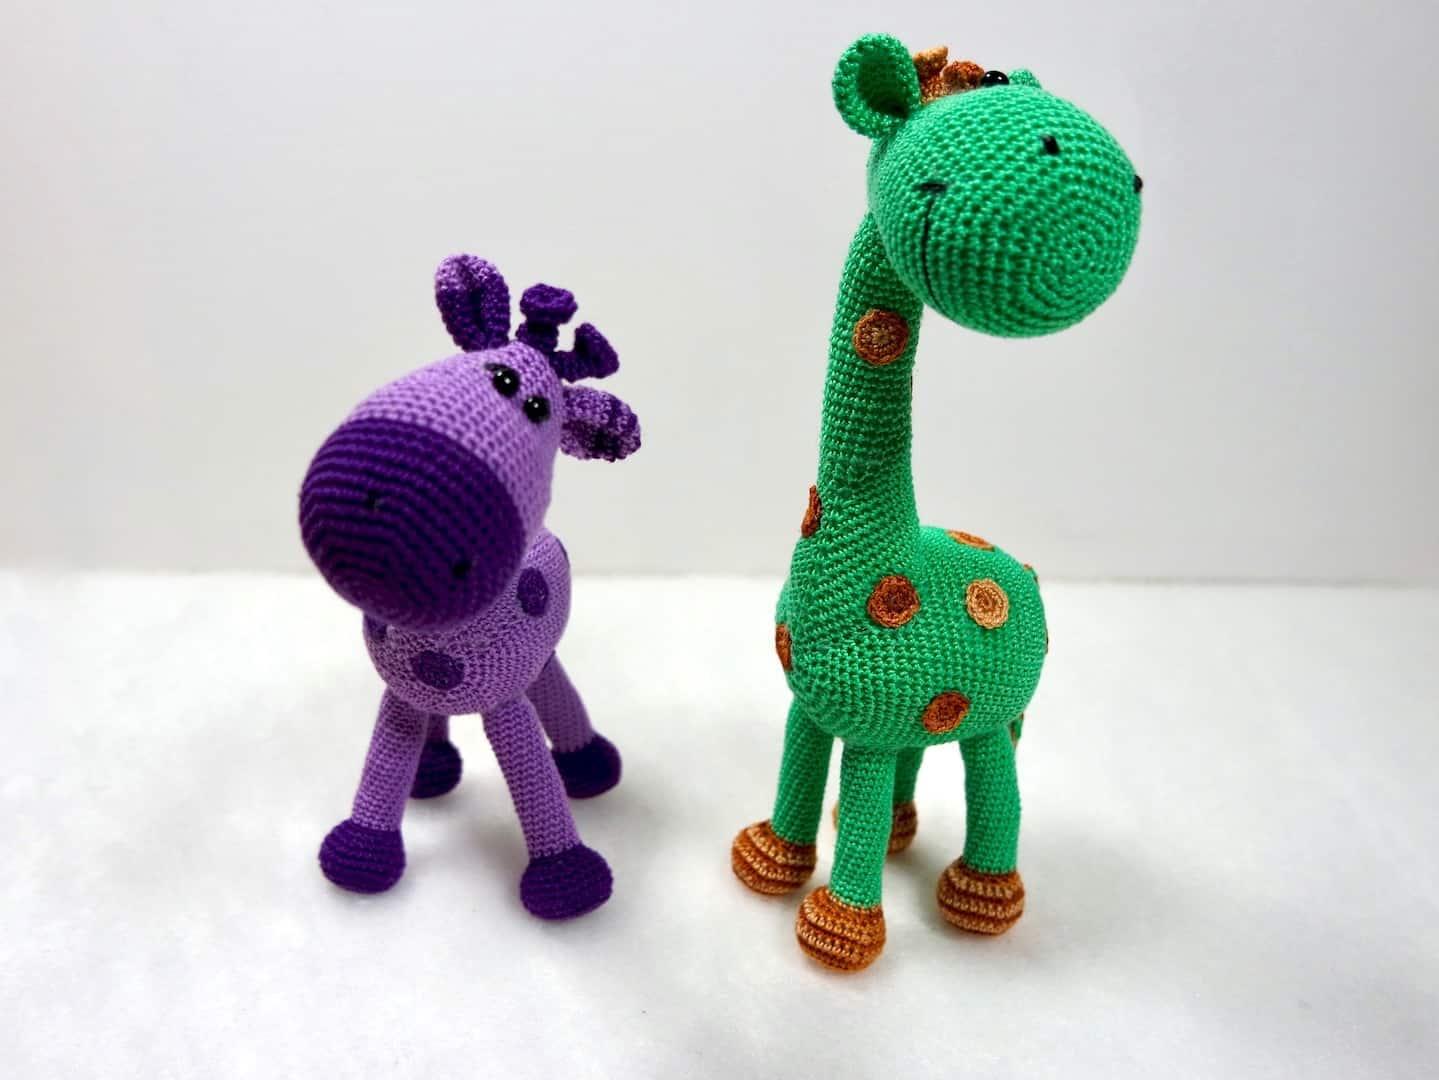 Crochet pattern Giraffe April crochet amigurumi giraffe, English ... | 1080x1439